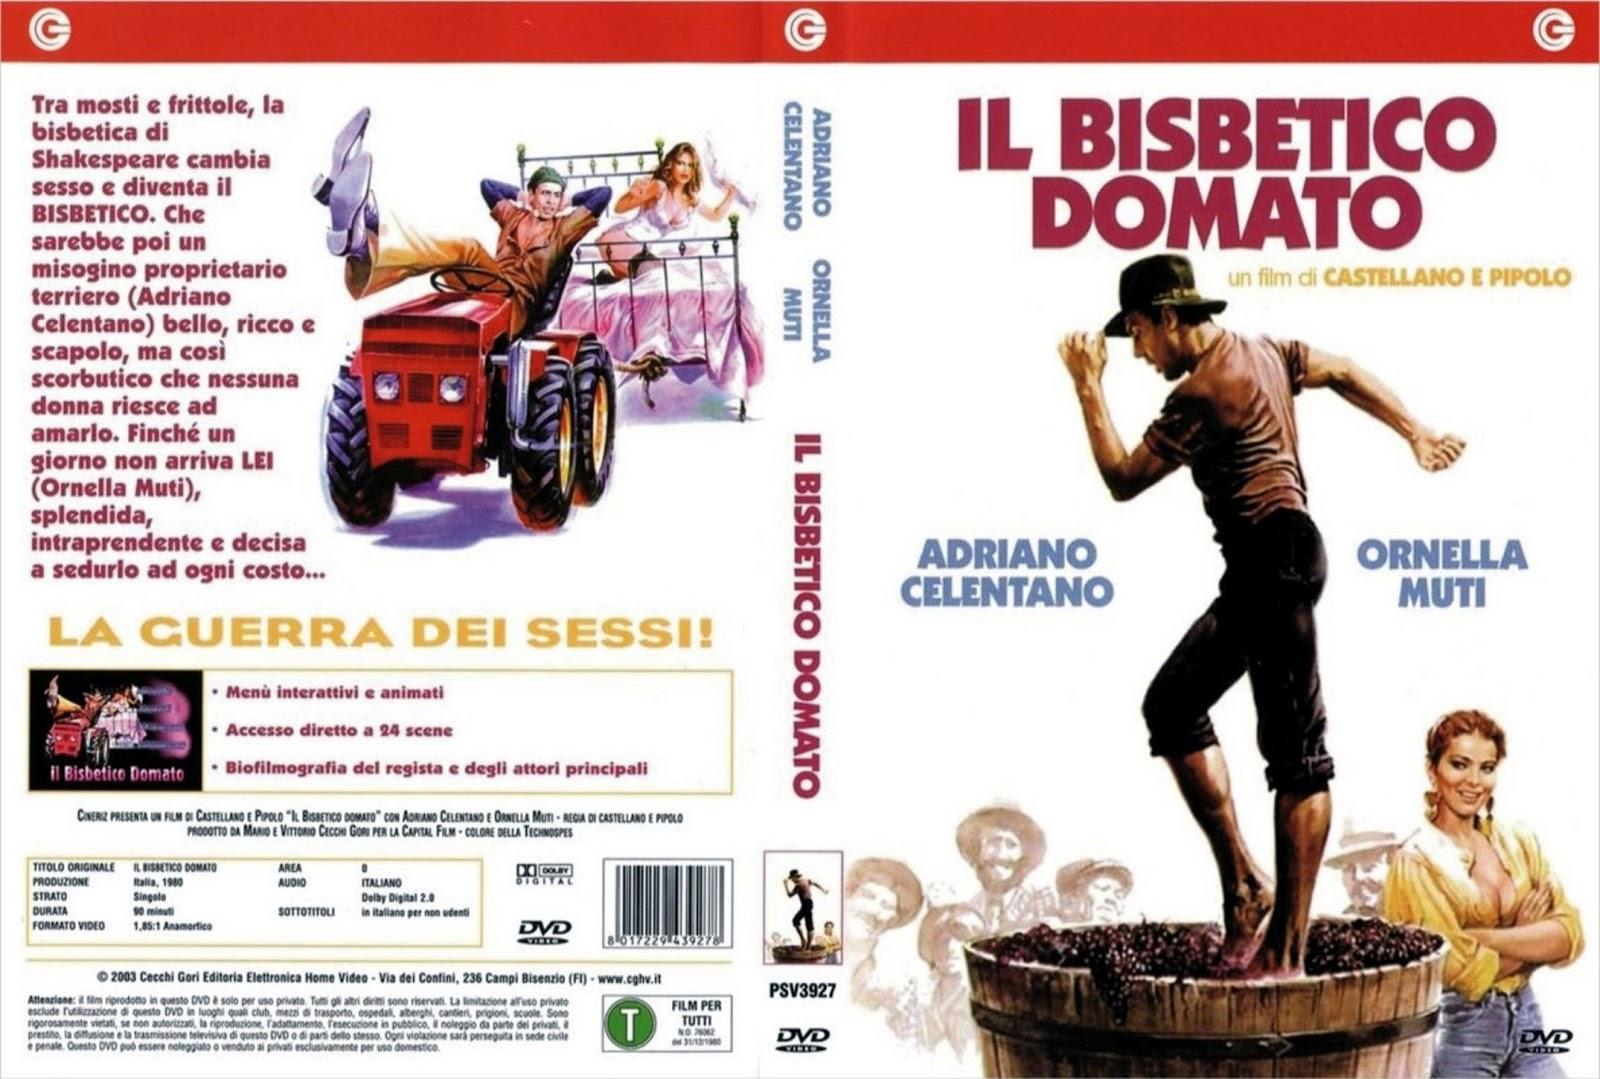 http://4.bp.blogspot.com/-OML6EkPMDkk/TyxyQLIFVeI/AAAAAAAAIqo/ahG18bBGMSw/s1600/Il_bisbetico_domato.jpg